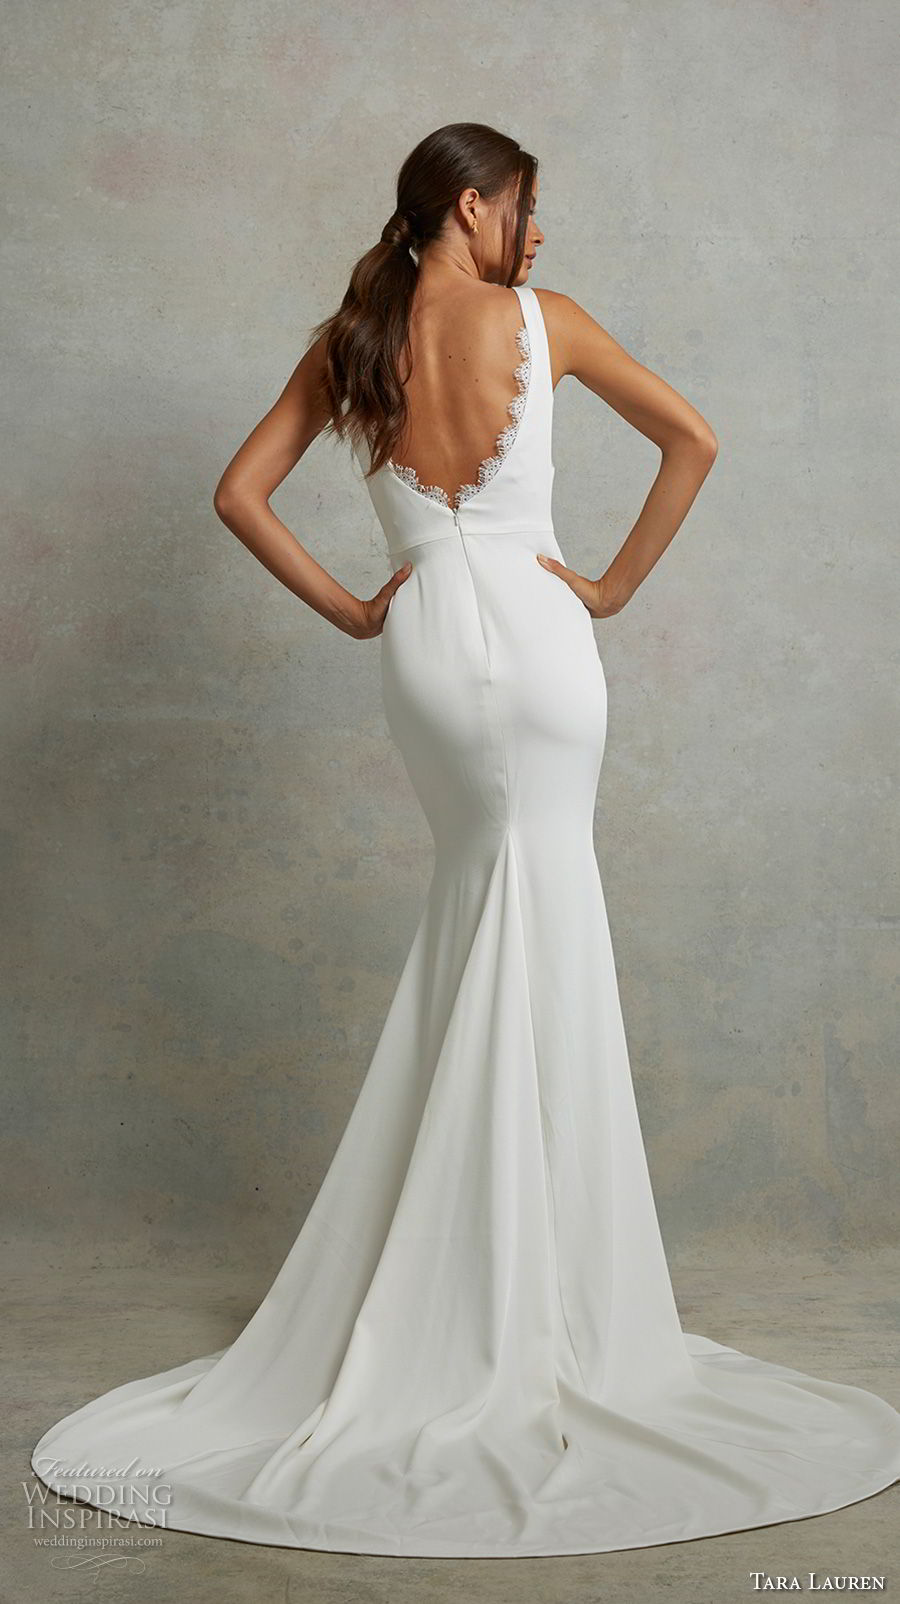 tara lauren spring 2018 bridal sleeveless v neck simple clean elegant fit and flare wedding dress open v back short train (2) bv